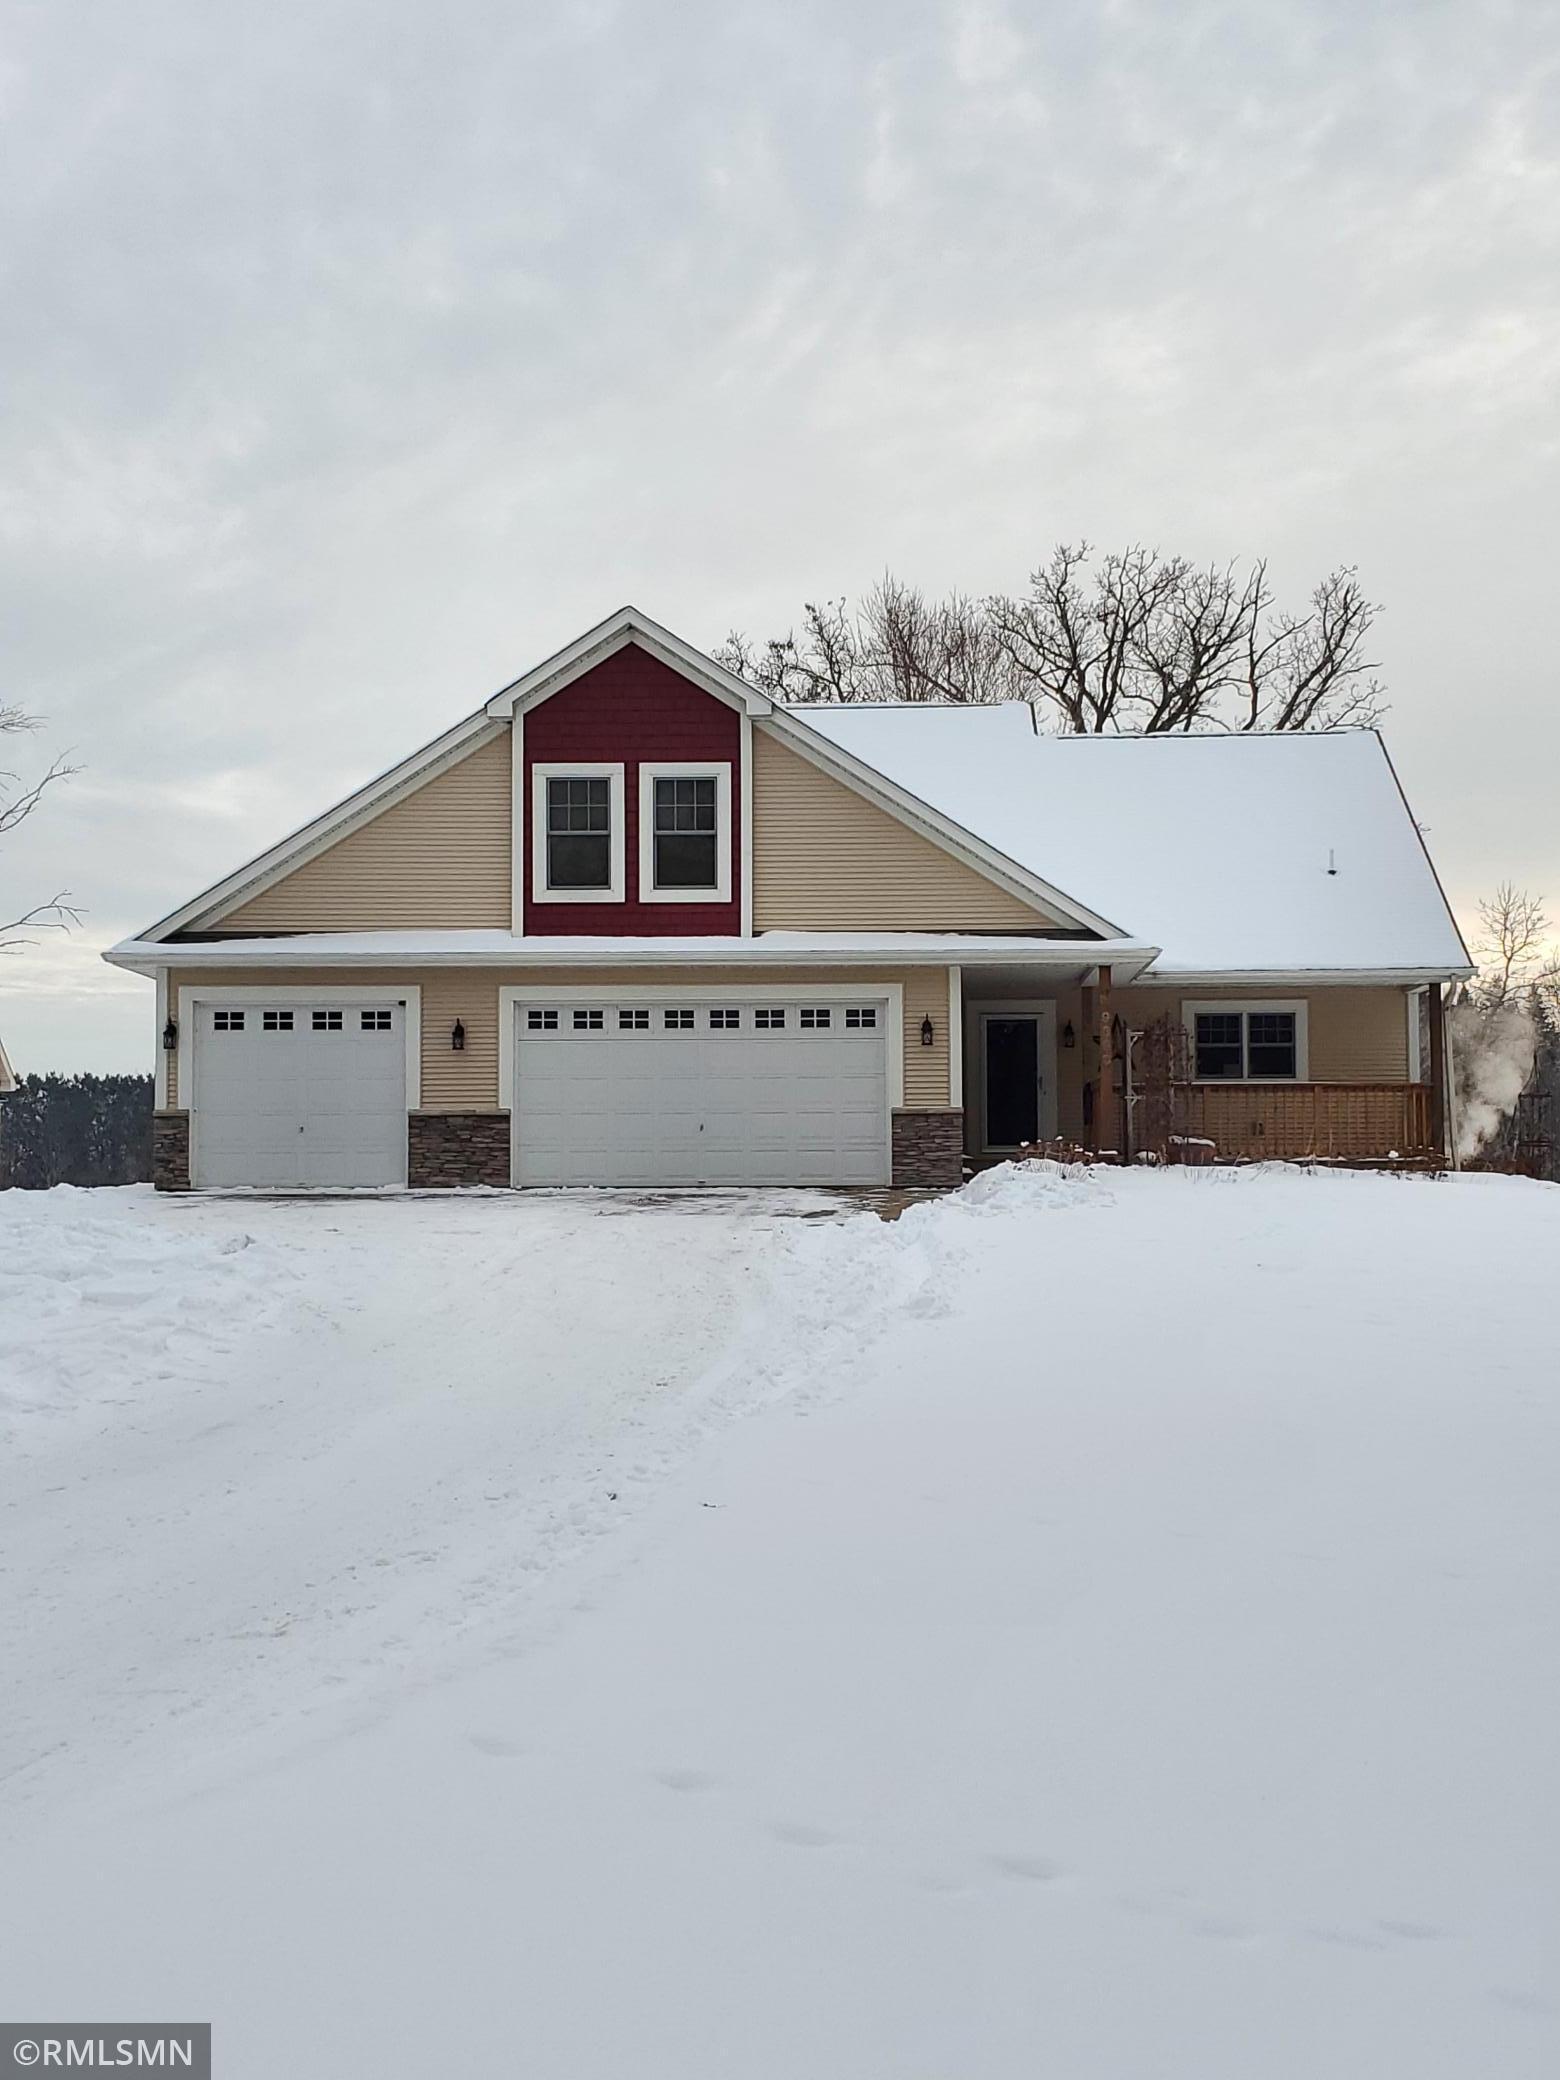 9390 234th Lane NE Property Photo - Stacy, MN real estate listing